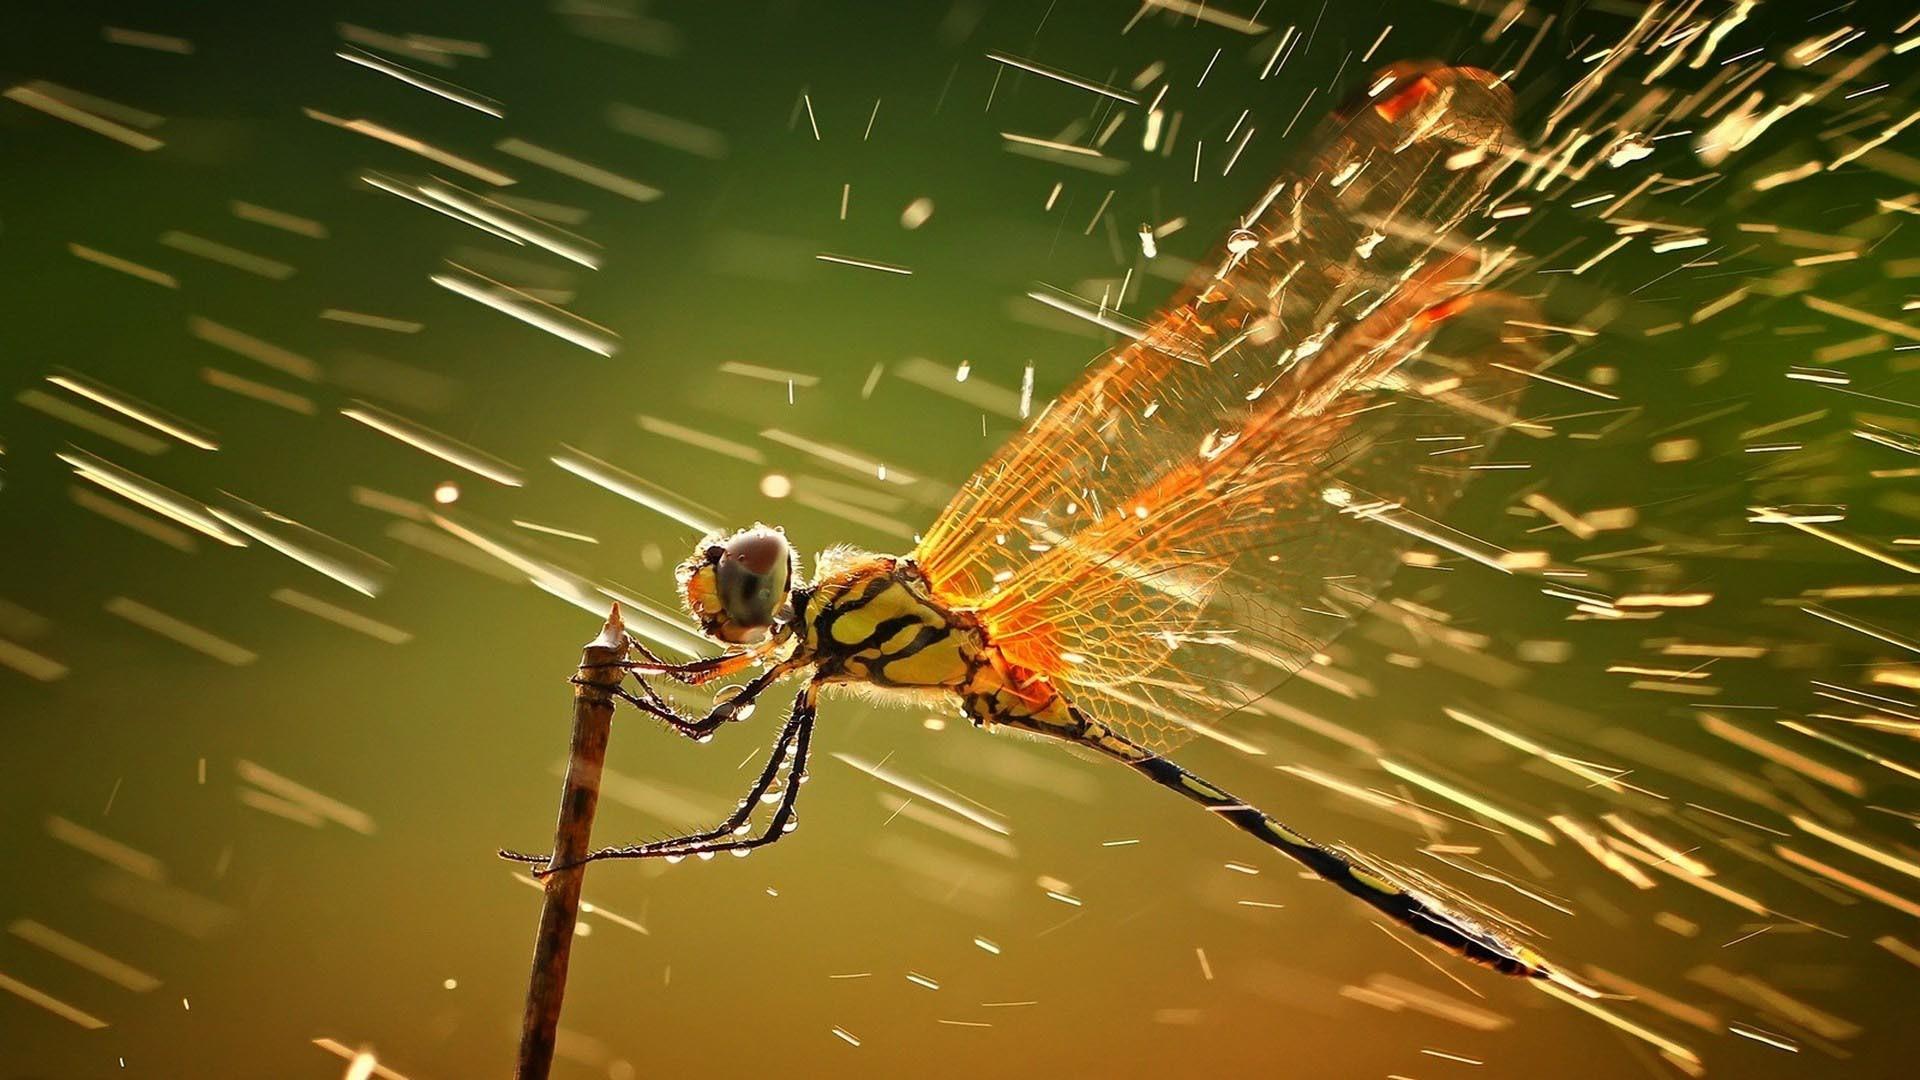 Res: 1920x1080, Dragonfly Amazing New Full Hd Desktop Wallpaper